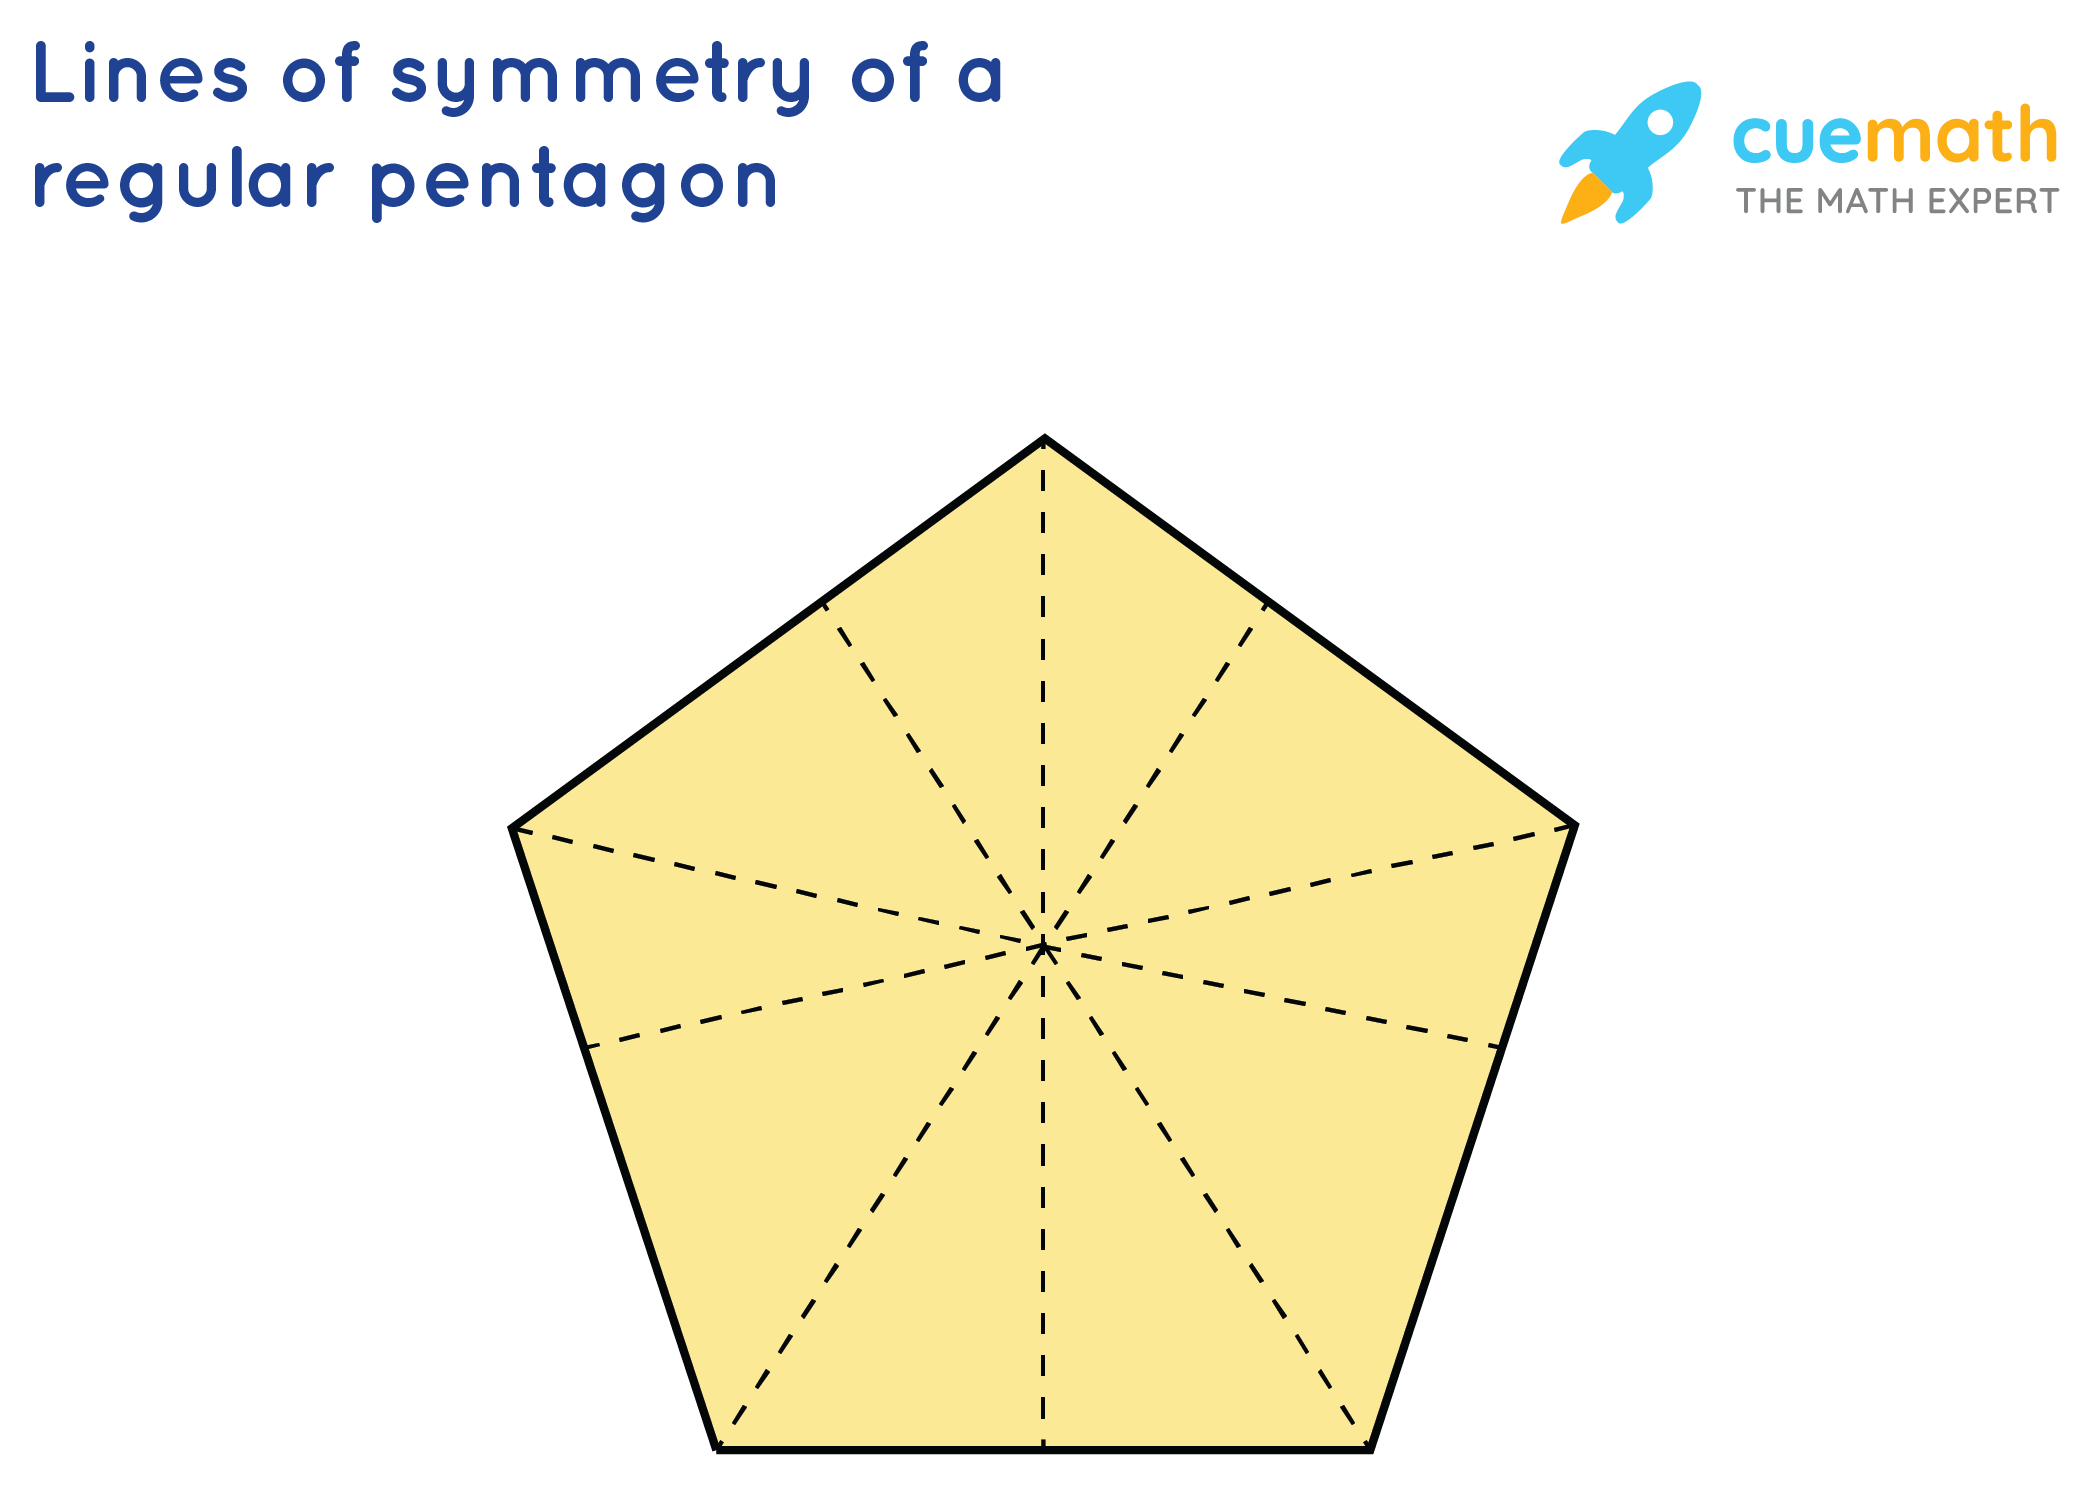 Lines of symmetry of a regular pentagon